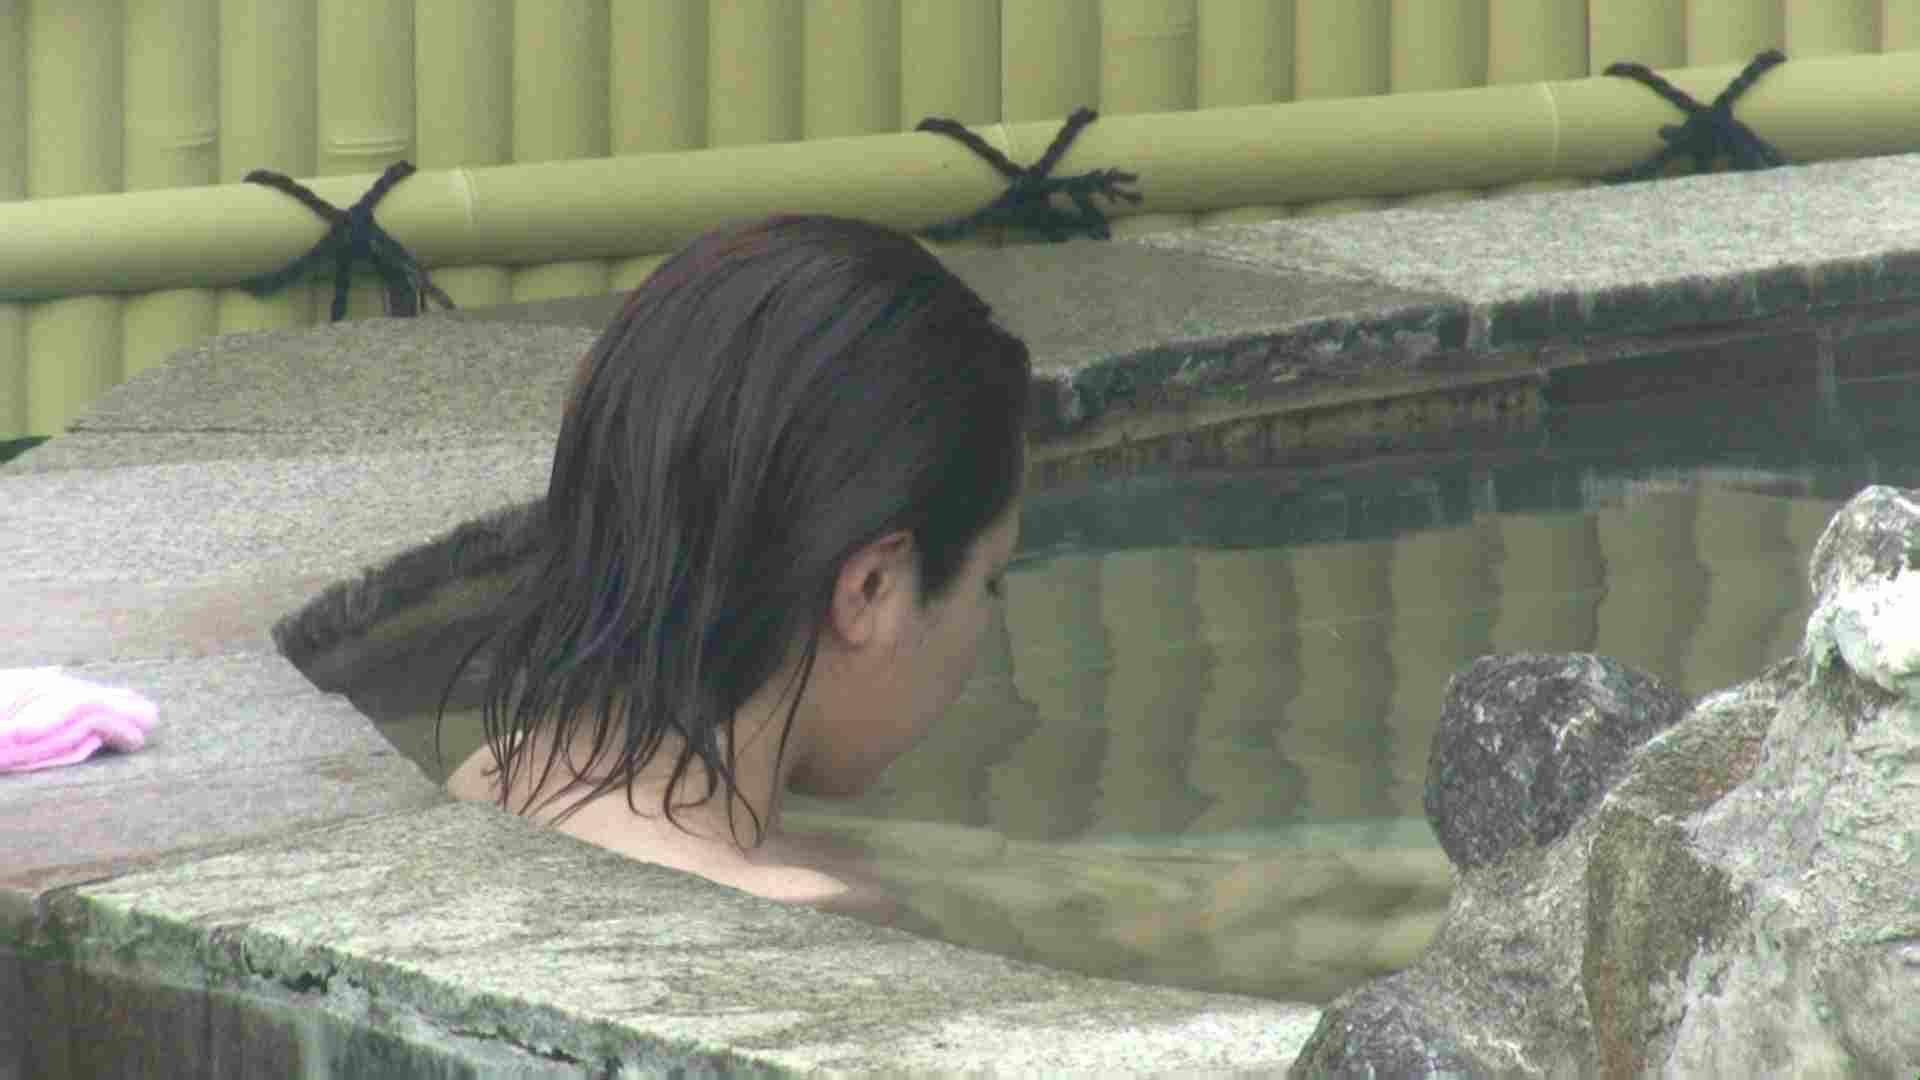 Aquaな露天風呂Vol.604 露天風呂突入   盗撮師作品  78pic 55